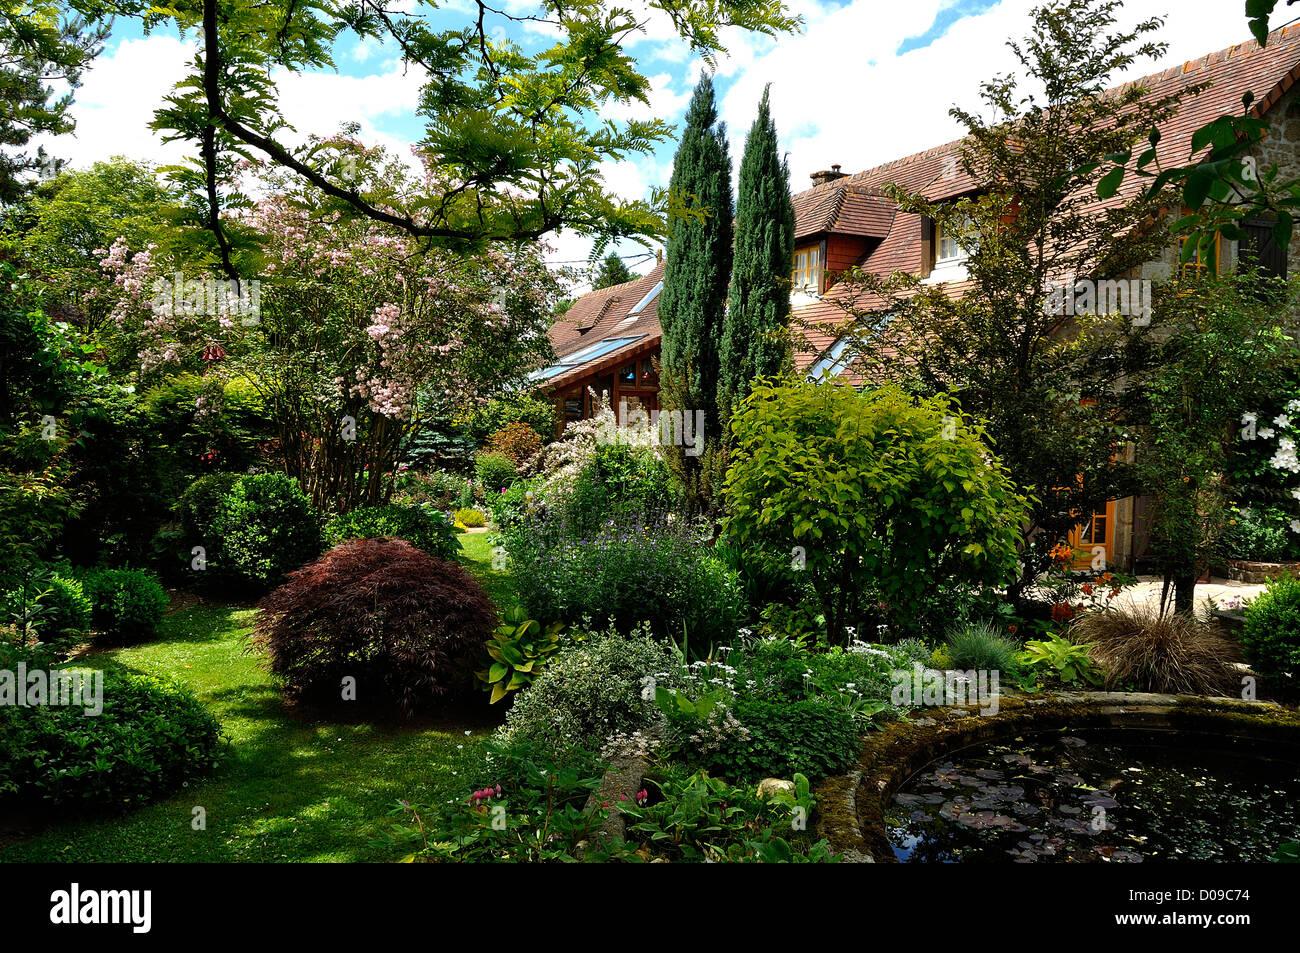 Pleasure garden with a basin and aquatic plants, Acer palmatum, hosta, boxwood, conifers, ... - Stock Image